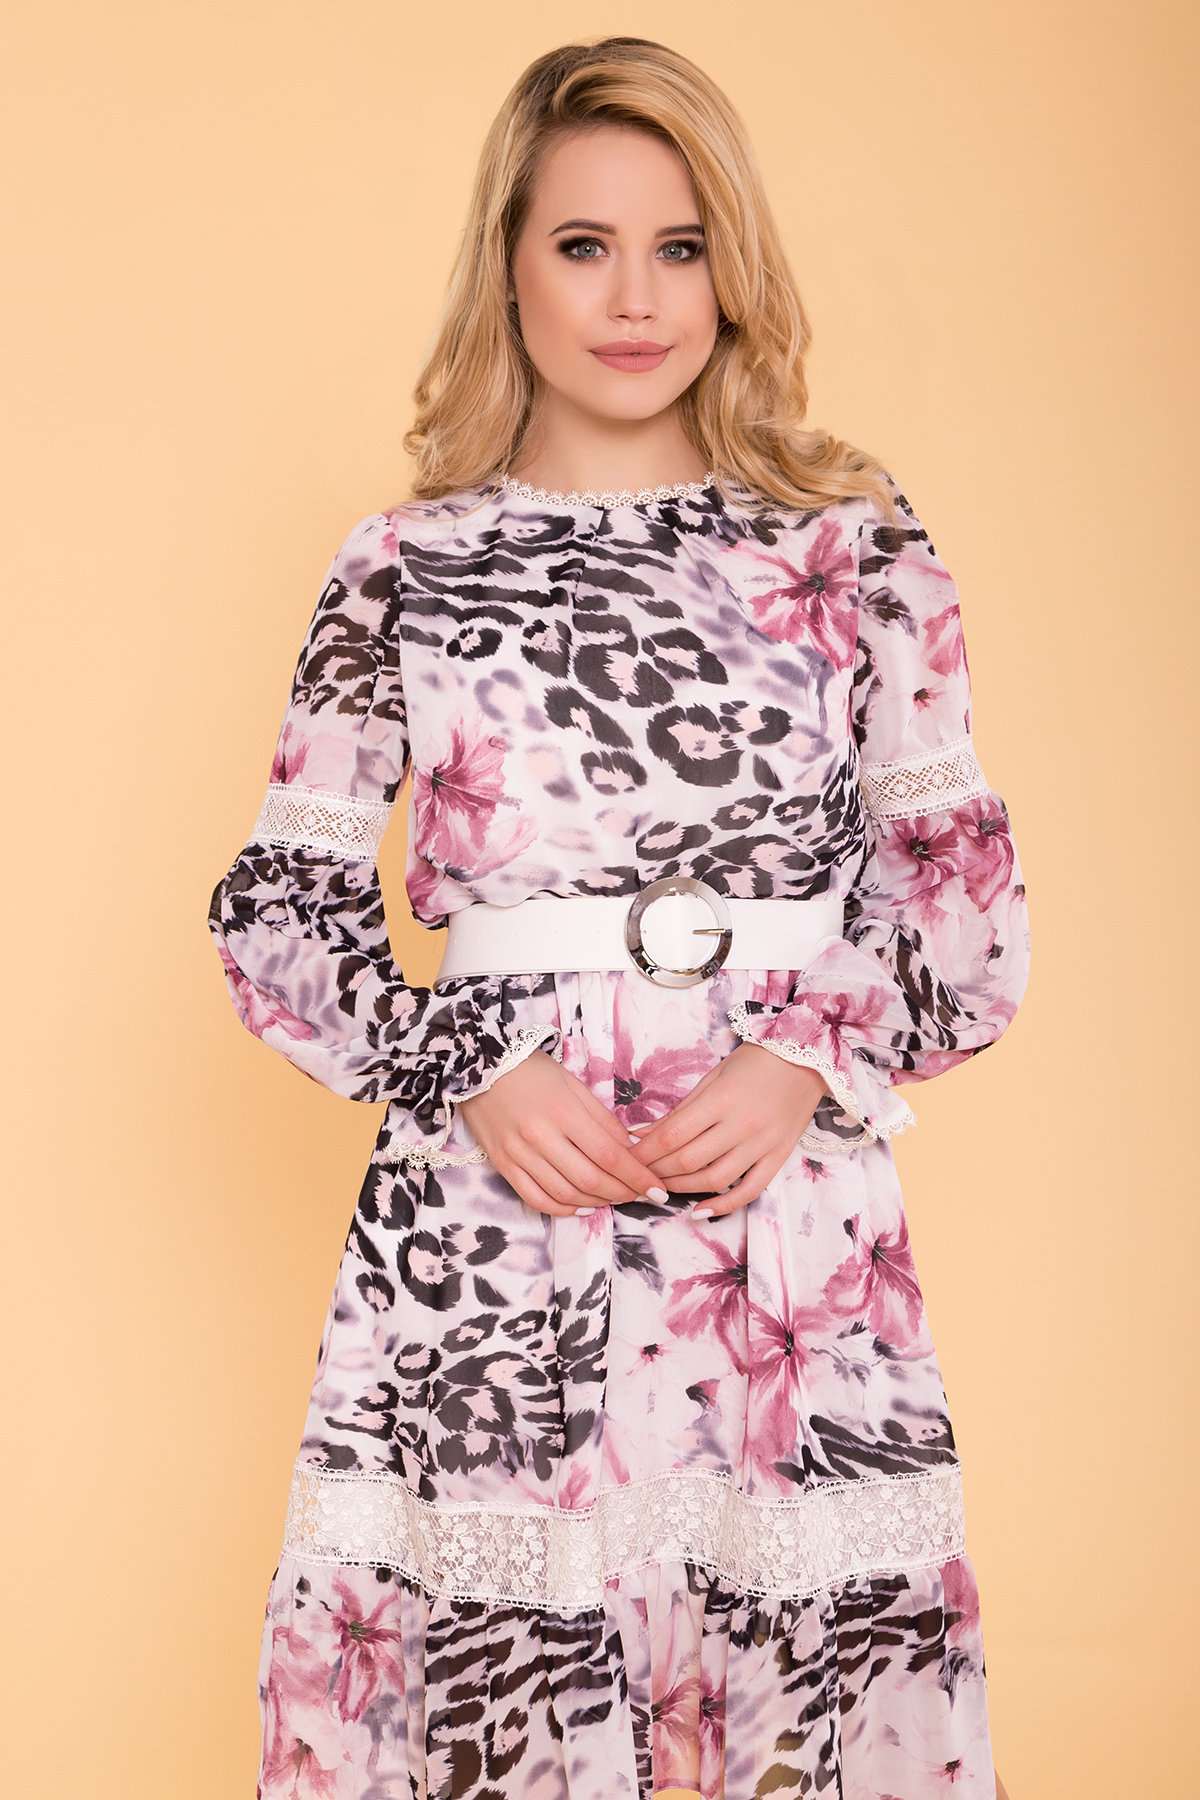 Санем платье из шифона 6587 Цвет: Леоп цвет мол/пудр/мол